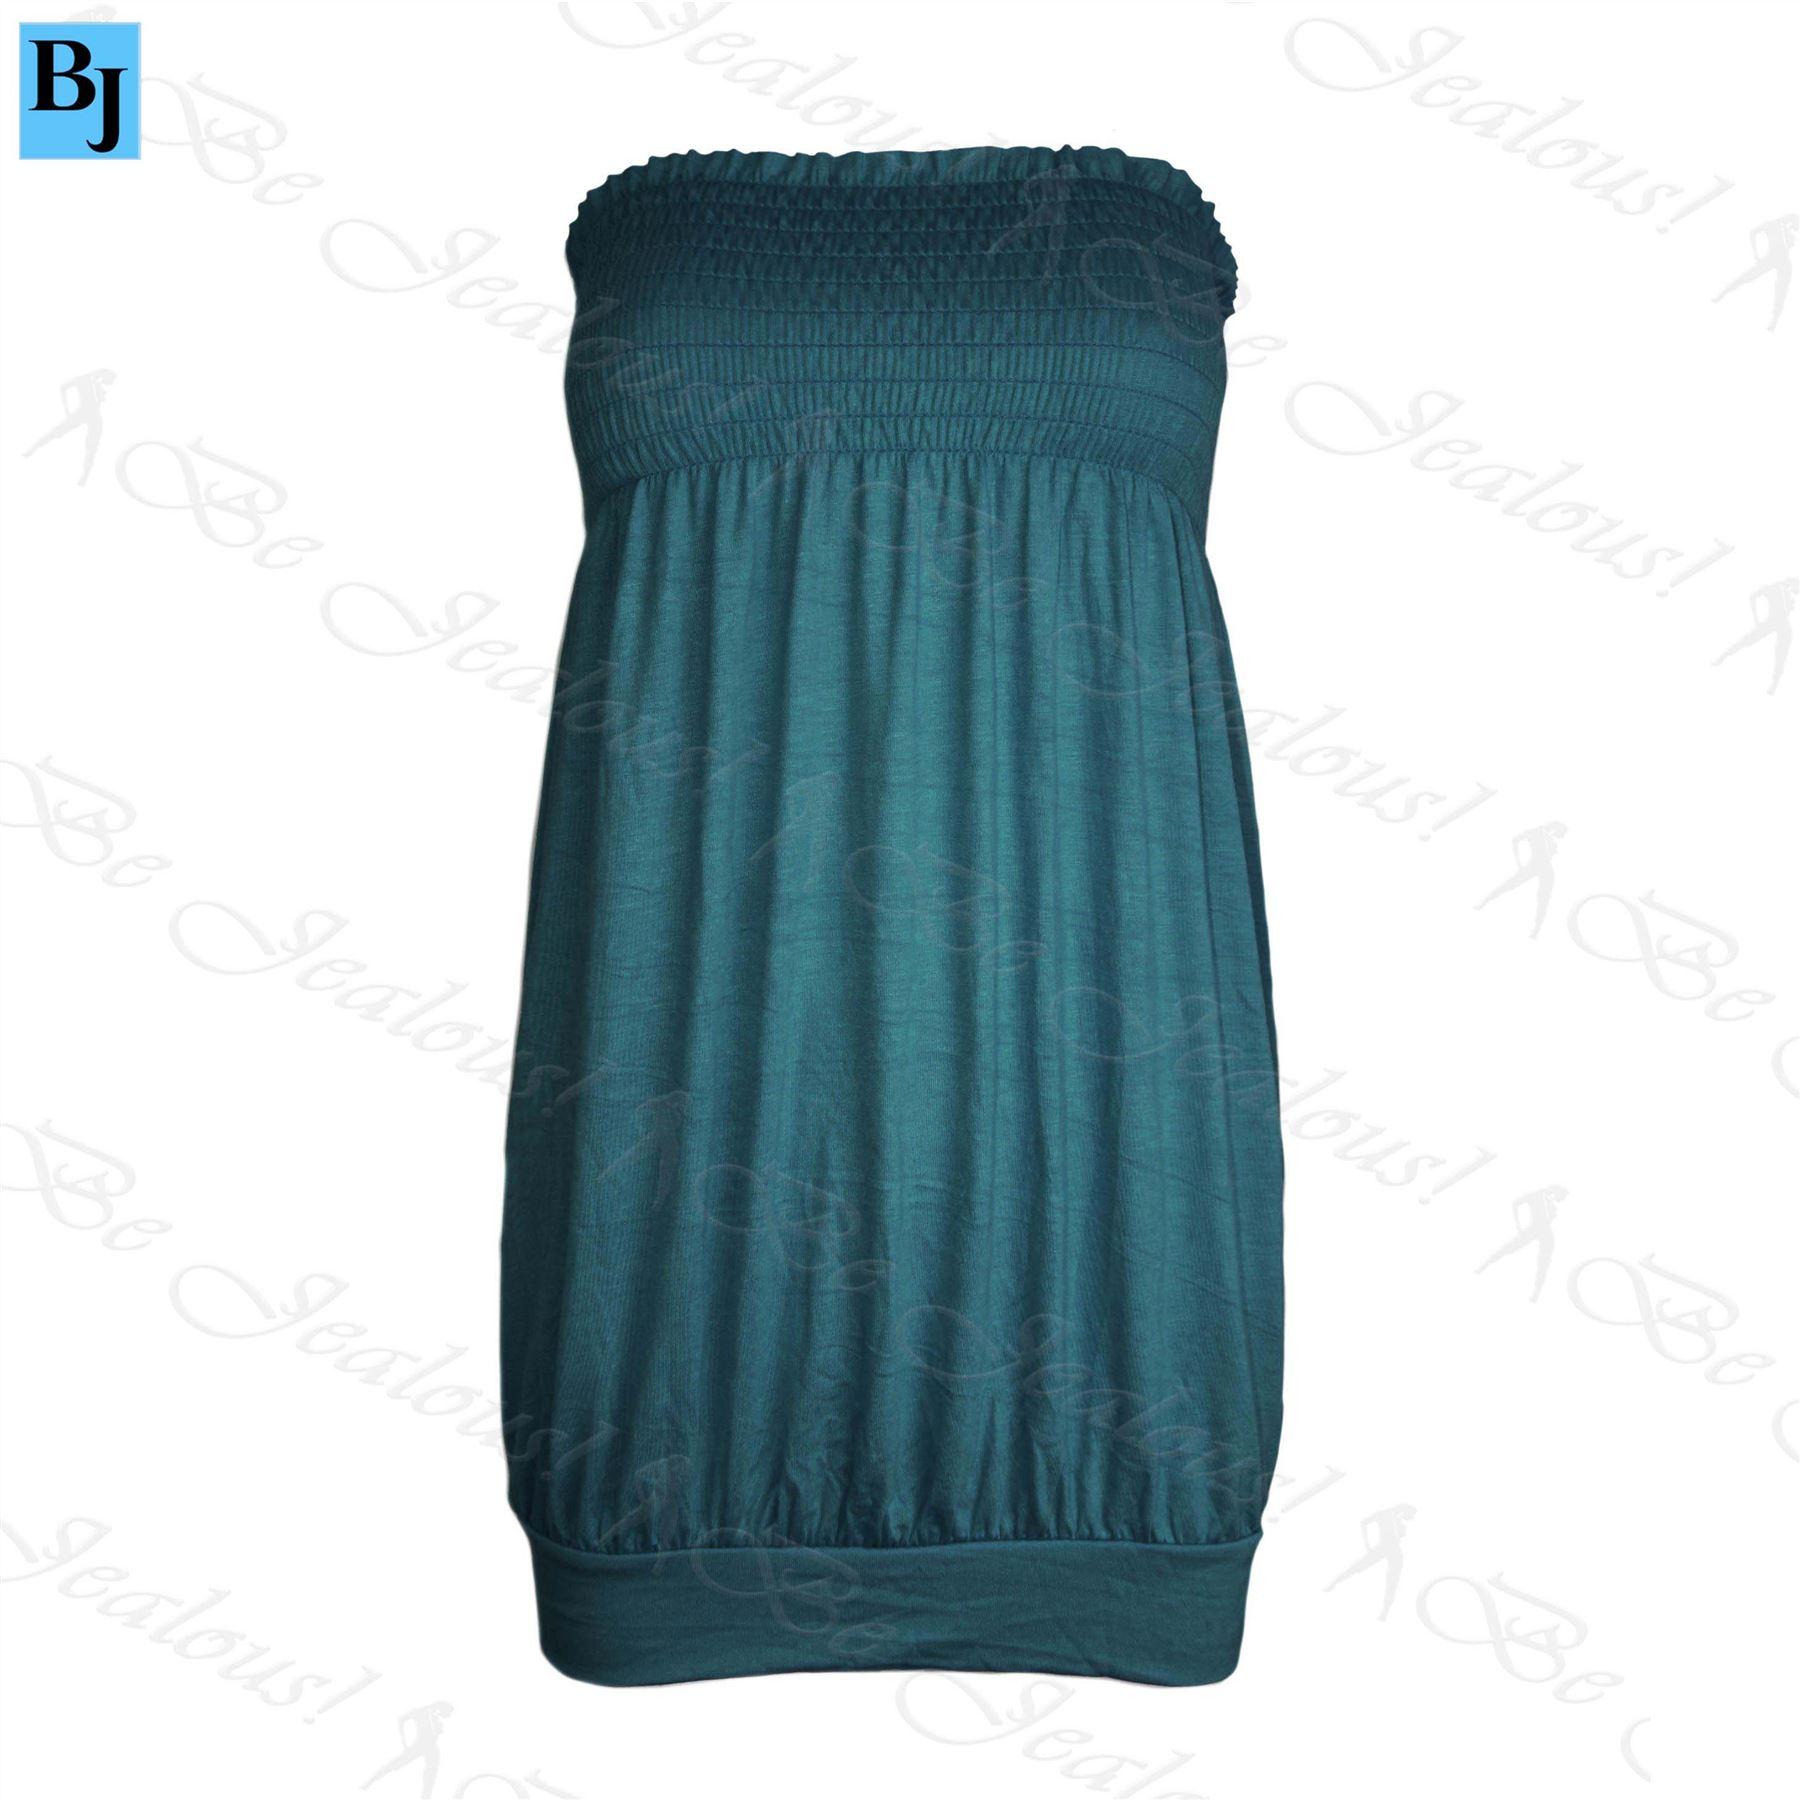 Womens-Ladies-Celeb-Casual-Plain-Sheering-Baggy-Jersey-Vest-Bandeau-Boobtube-Top